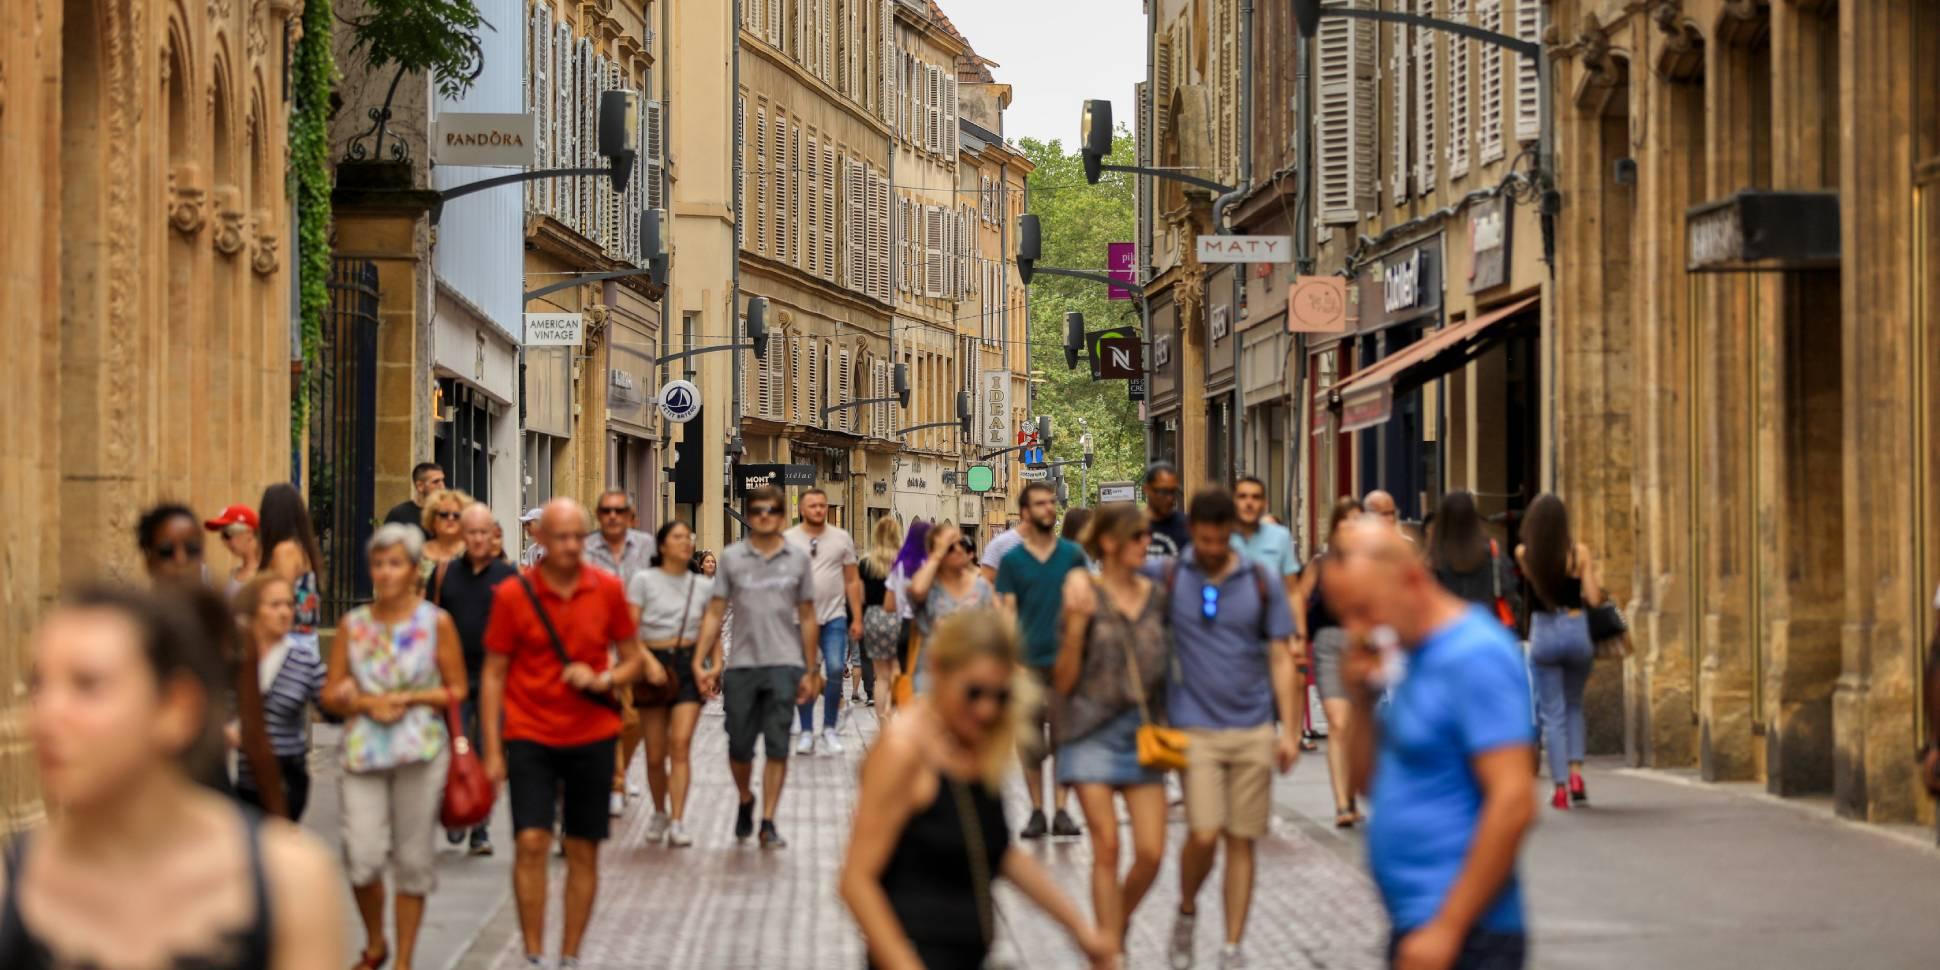 Femeie de intalnire in Metz